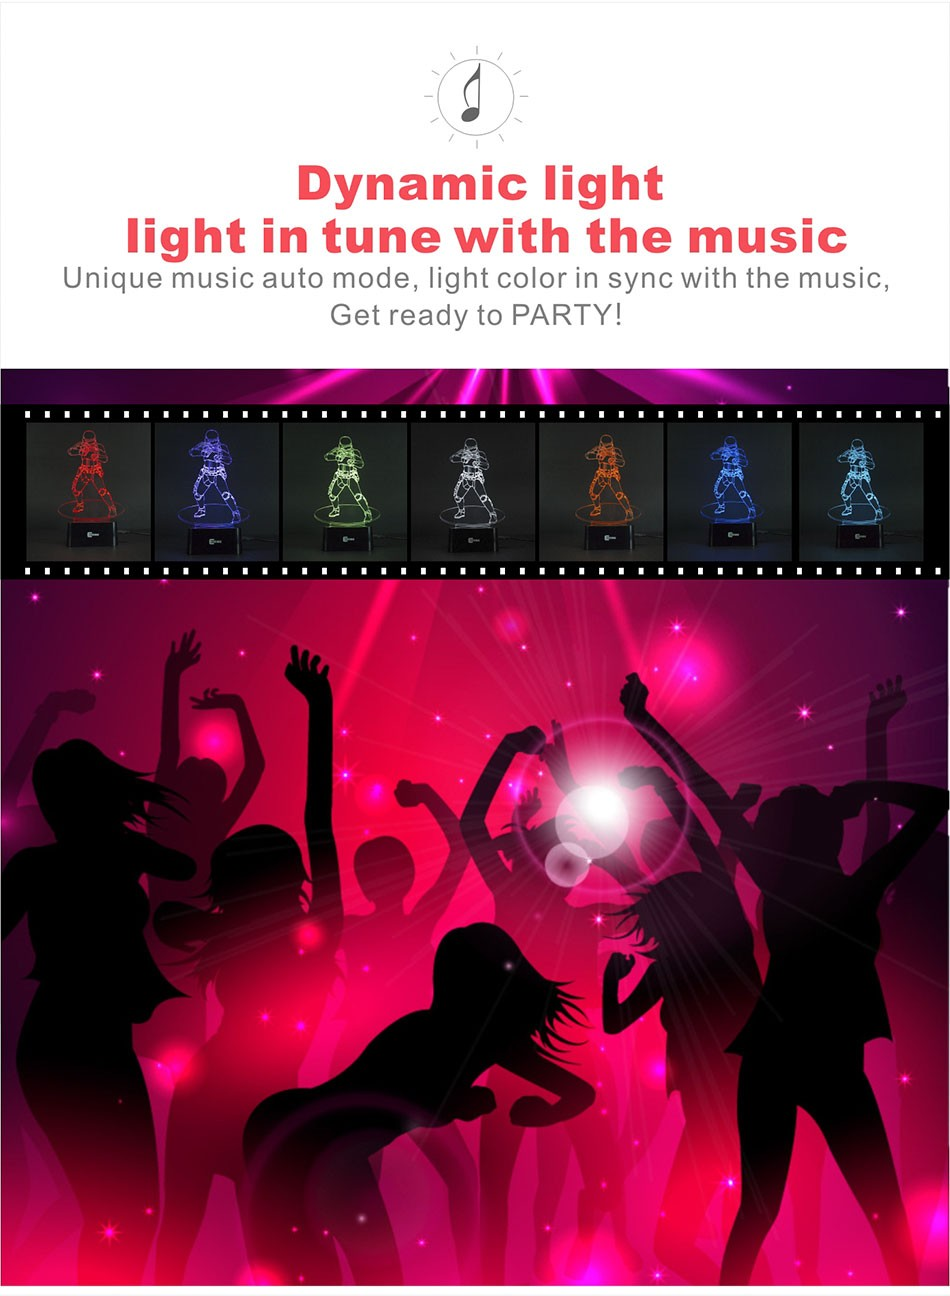 CNHIDEE USB Novelty Star Wars Bluetooth Music Desk Lampara 3D Stormtrooper Bulbing Led Luz de Noche Engraving Night Light Decor as Creative Gifs  (4)